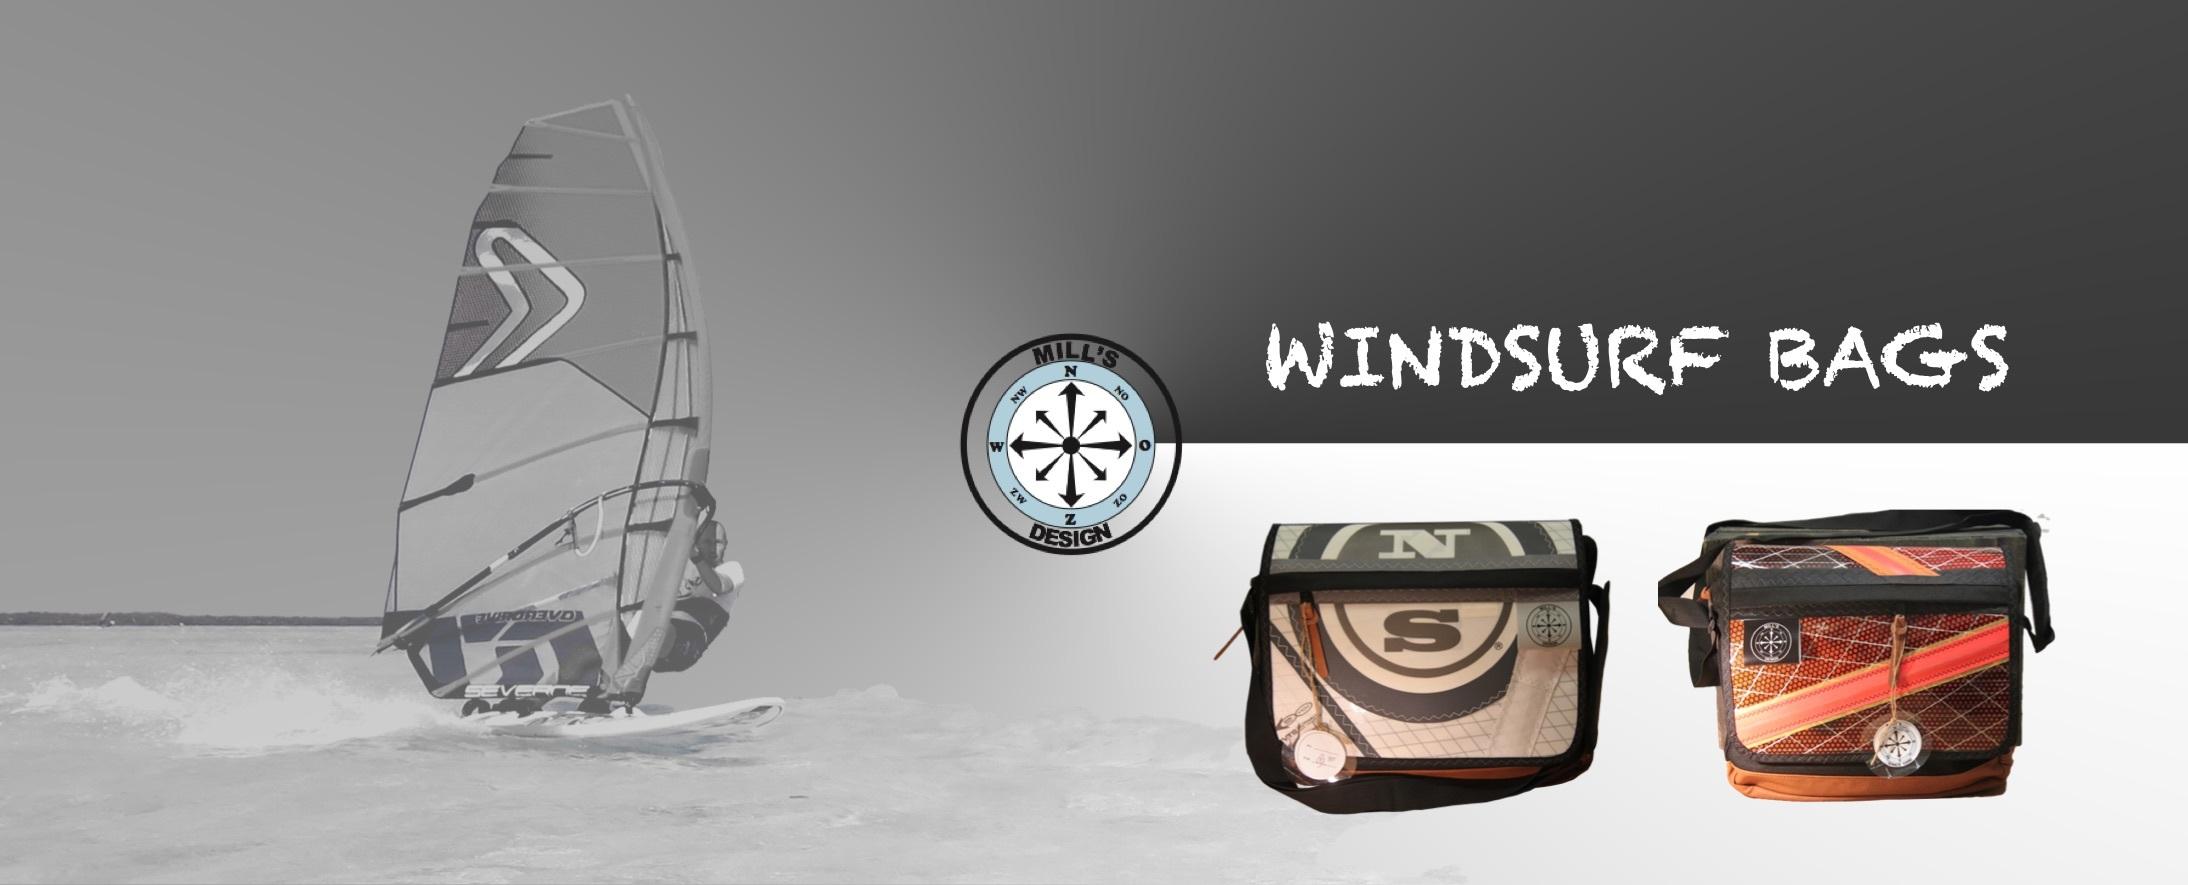 Mills Design Wndsurftas